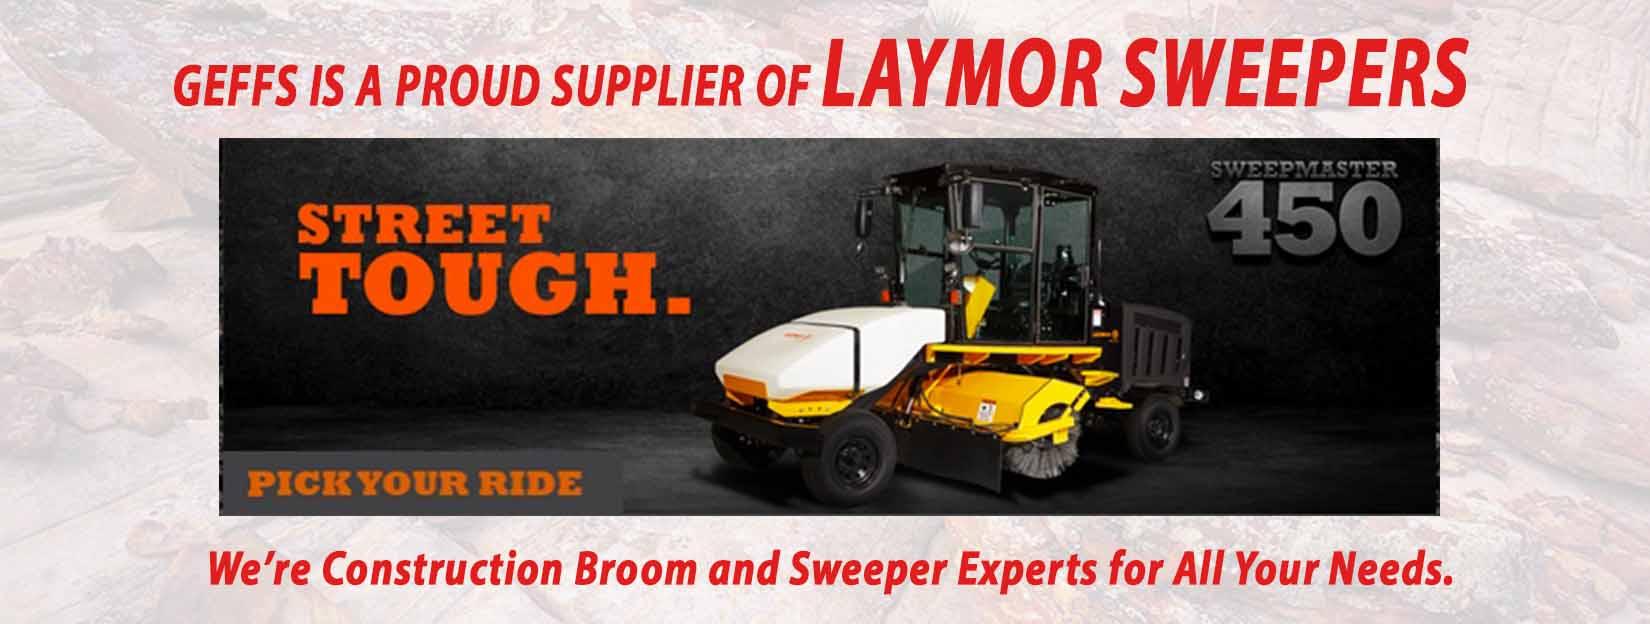 image of GEFFS LayMor Sweeper Slider